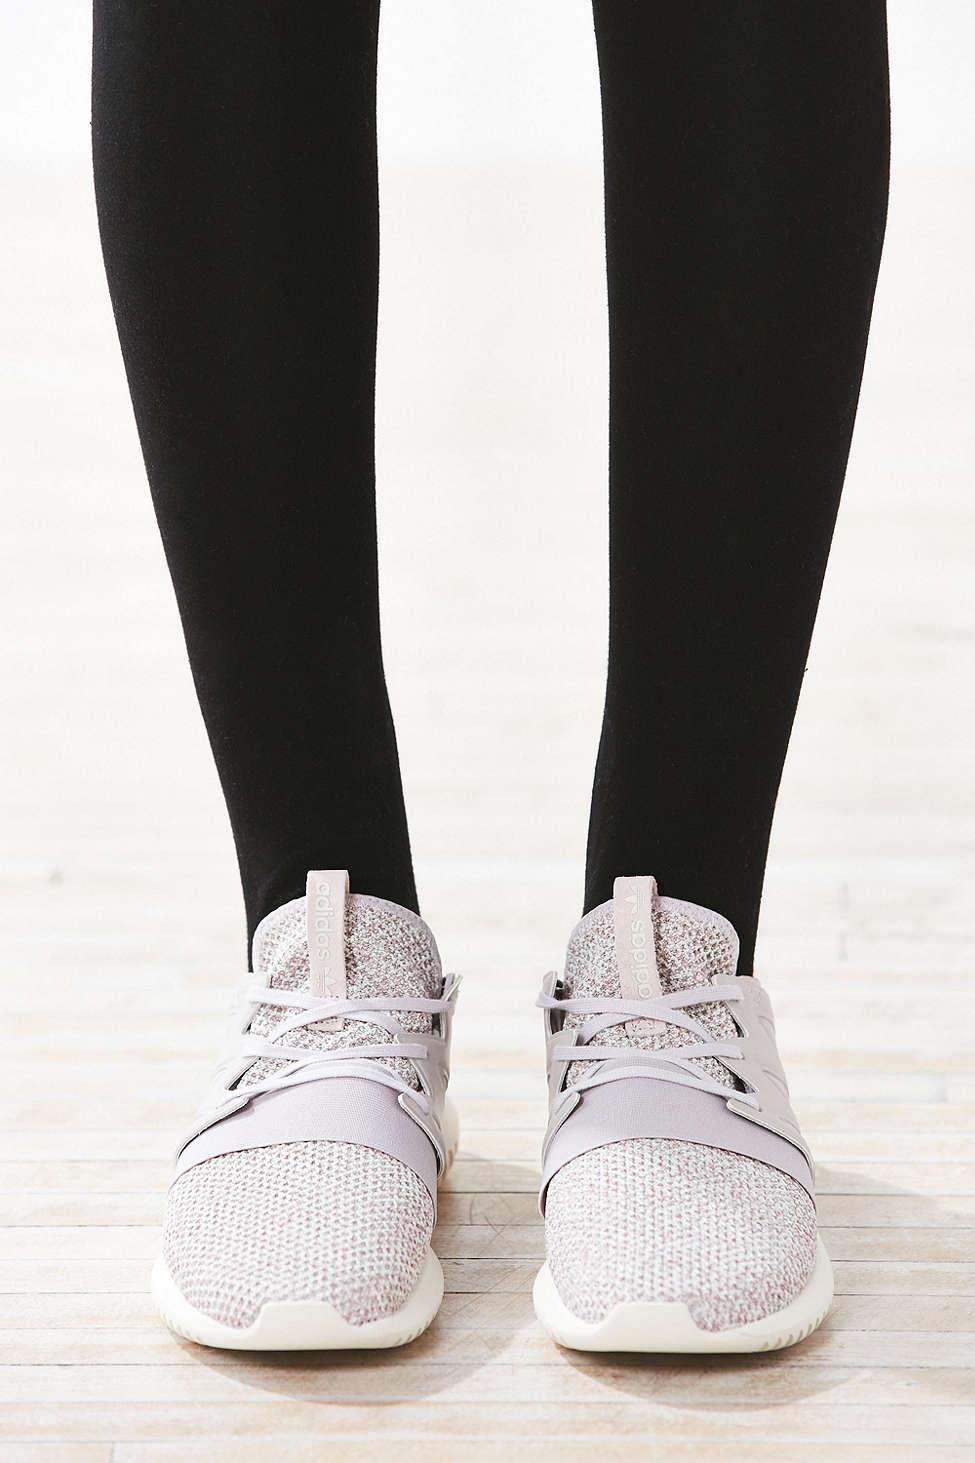 Lyst adidas originali tubolari a virale merletto scarpa